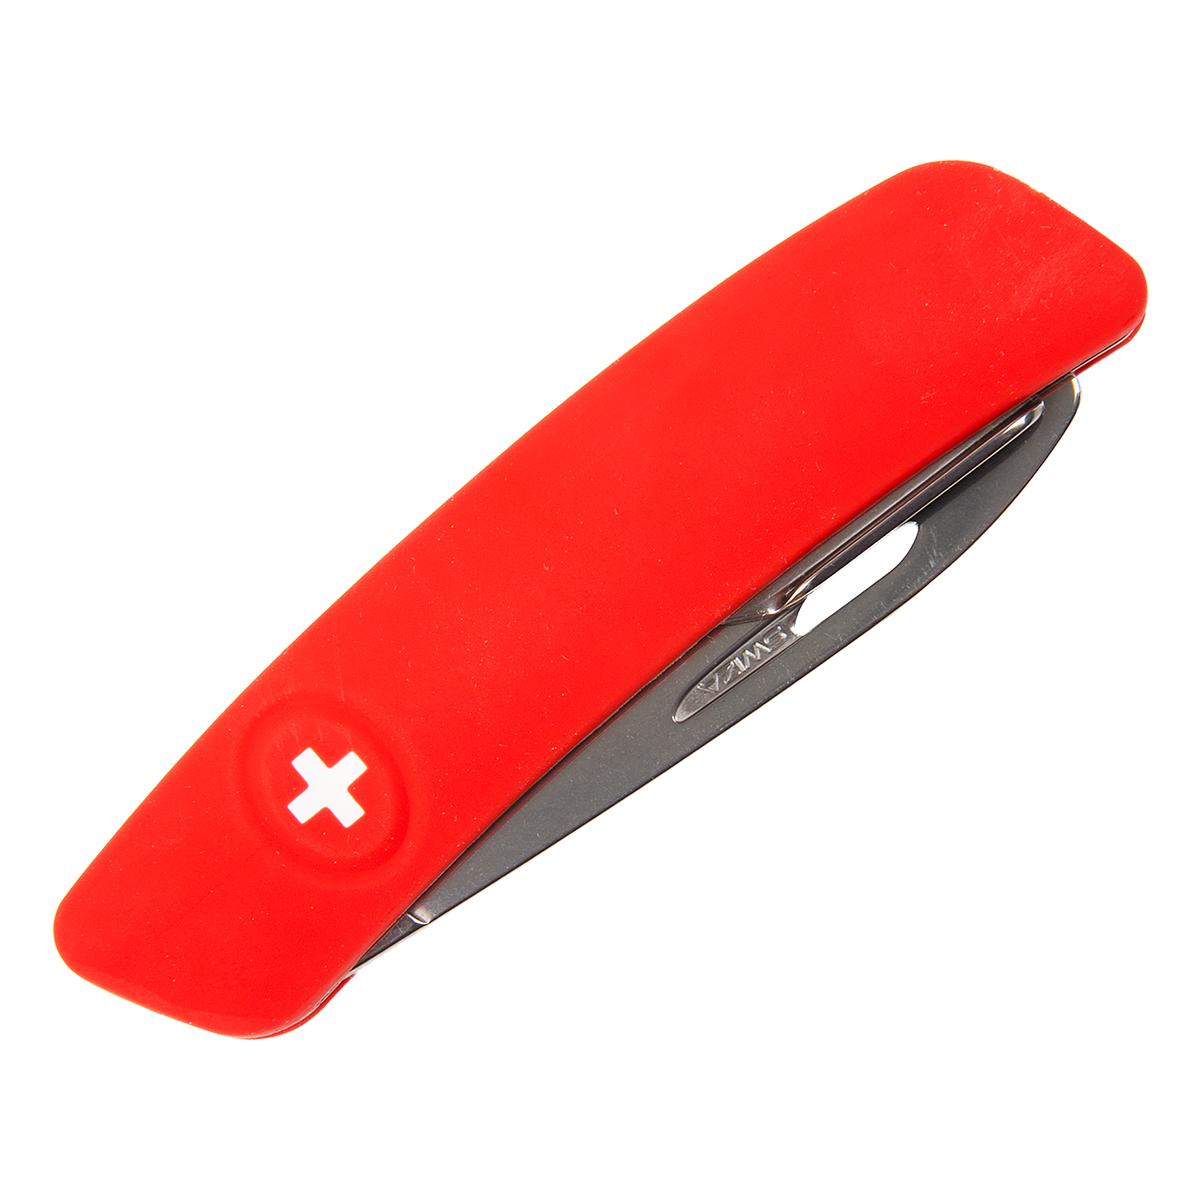 SWIZA Kindermesser J02 Rot im Pareyshop